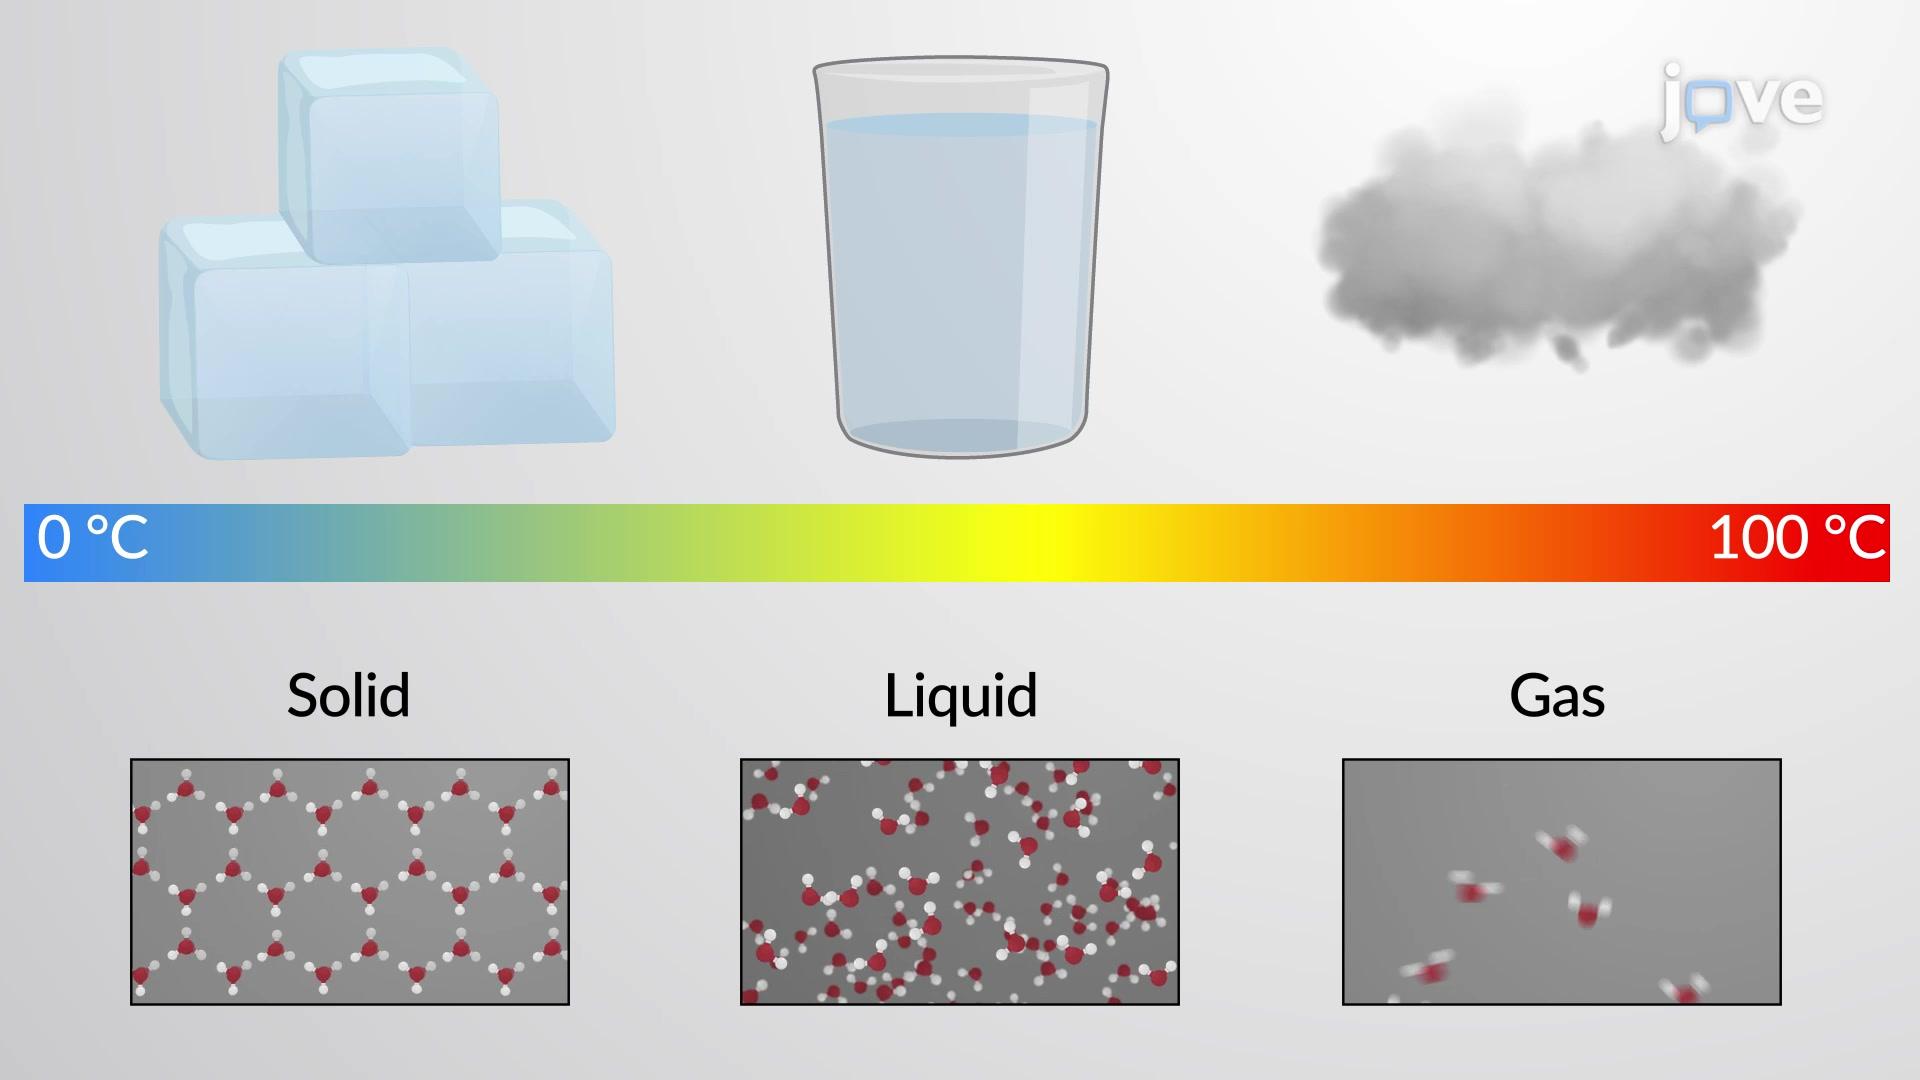 Molecular Comparison of Gases, Liquids, and Solids